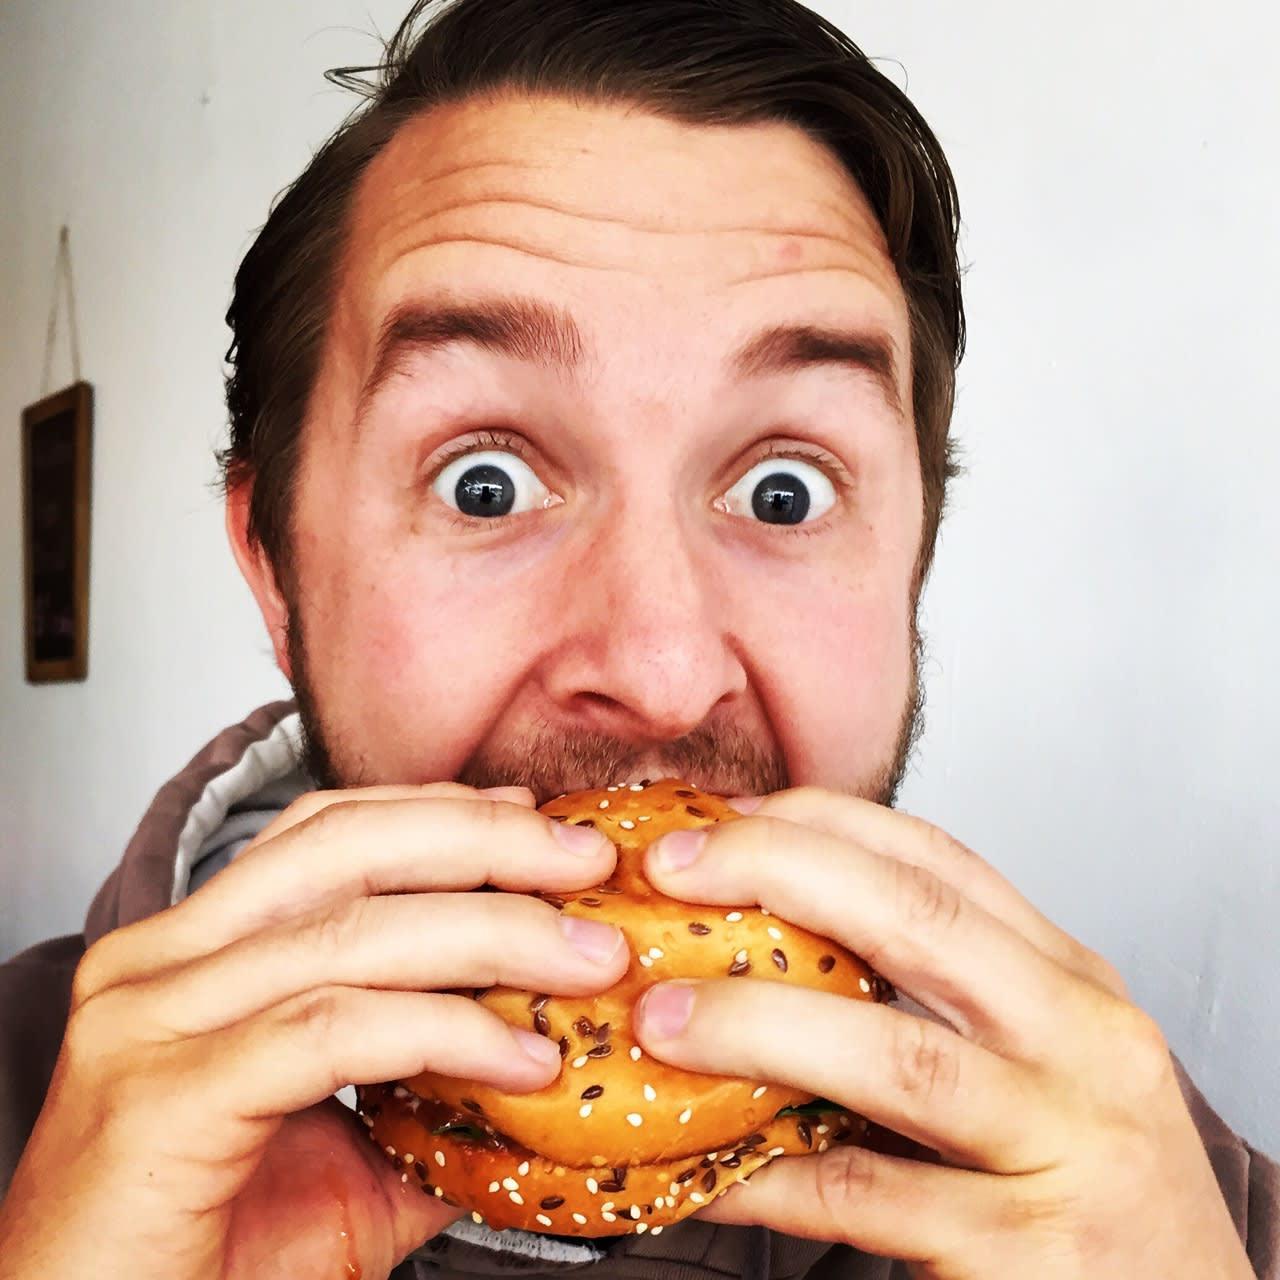 Photo of user: Spudsburgeradventures